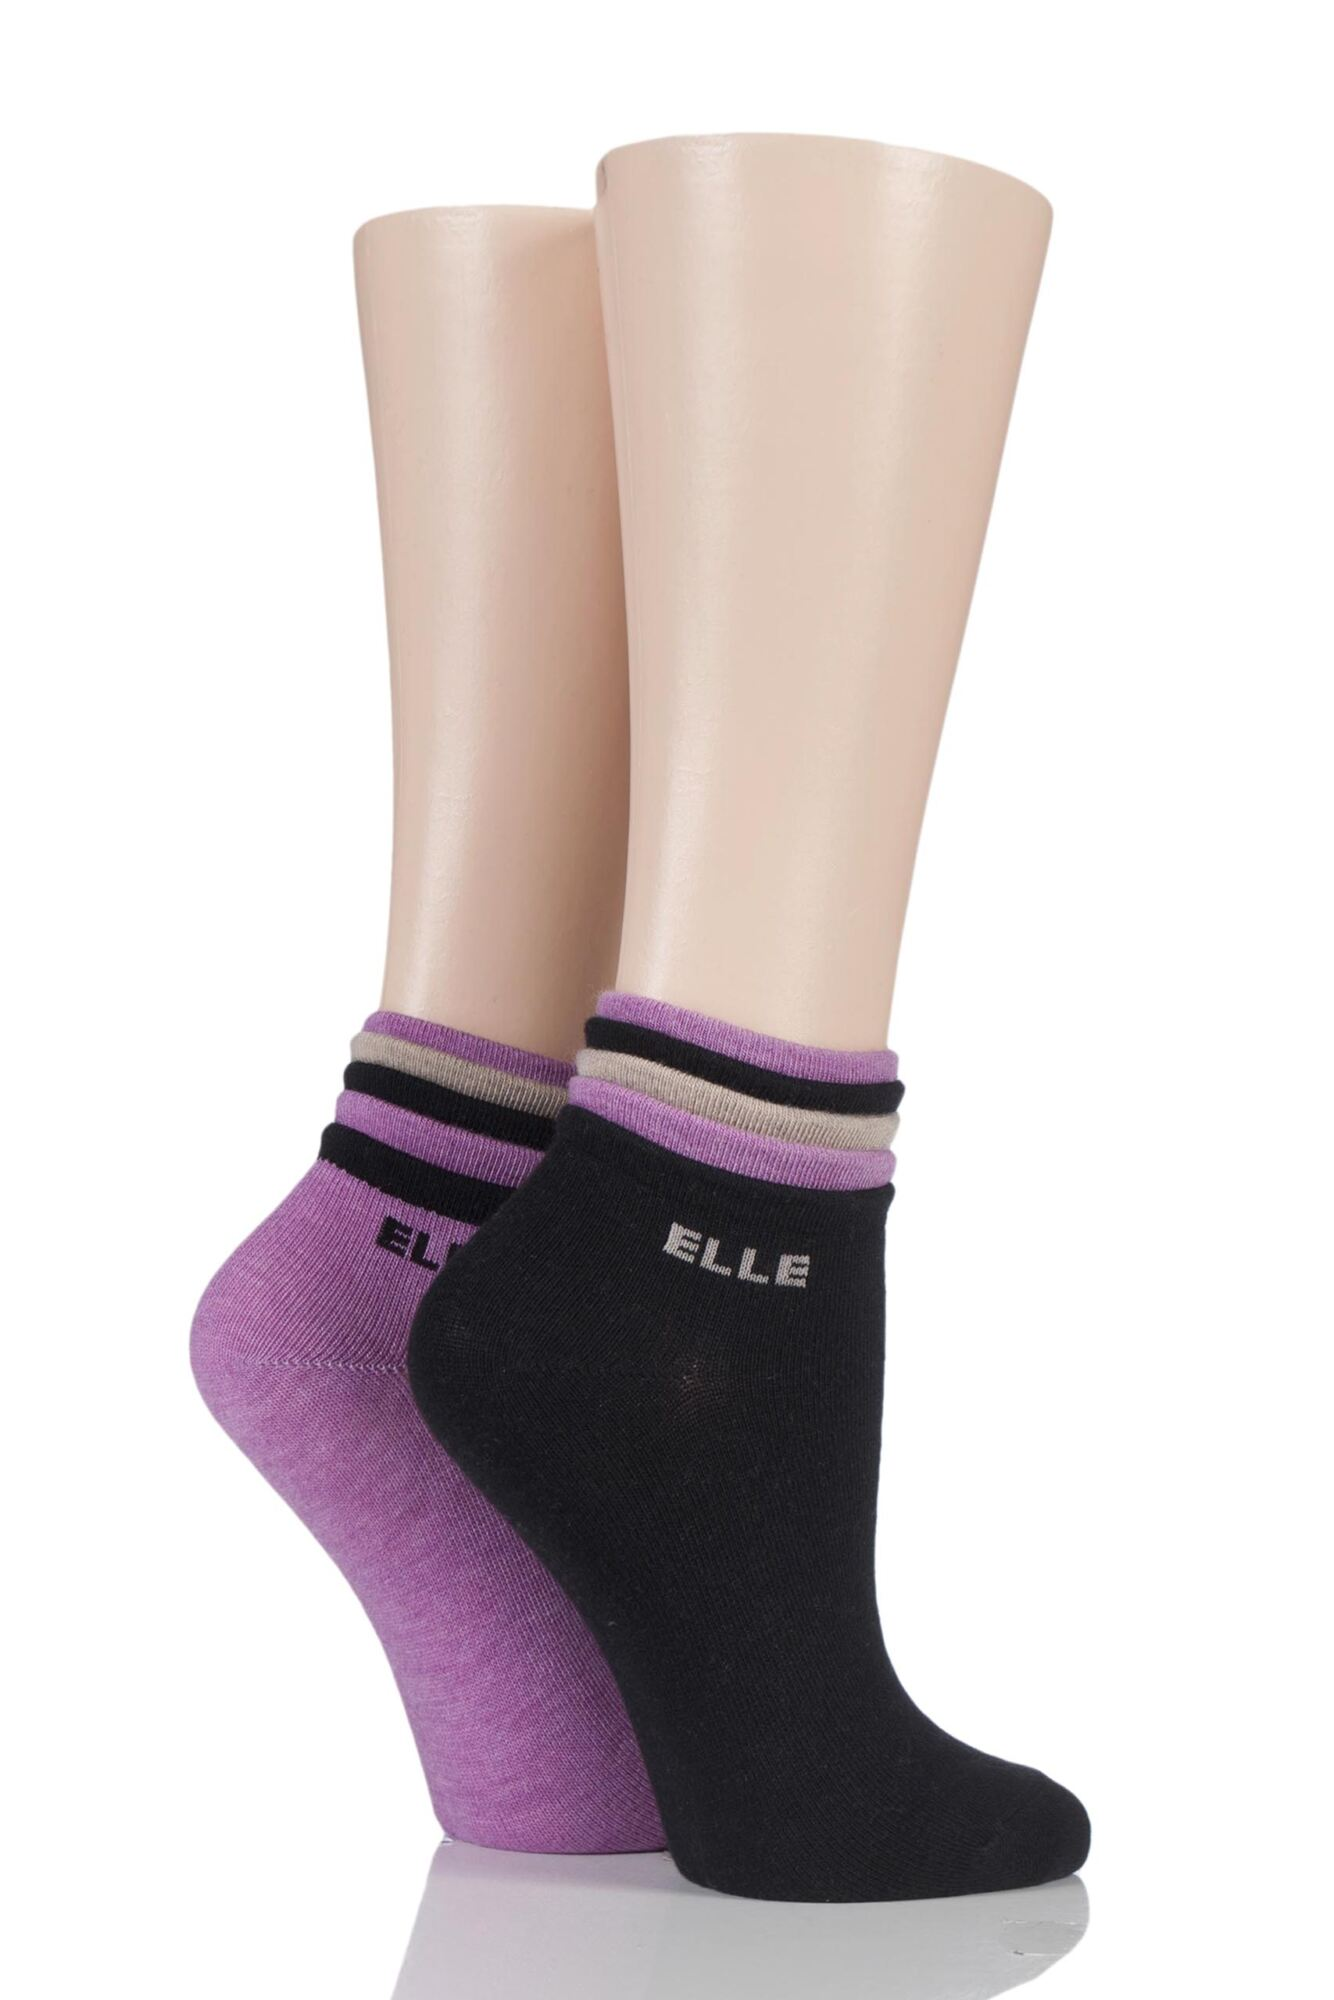 2 Pair Frilly Welt Cashmere Blend Ankle Socks Ladies - Elle